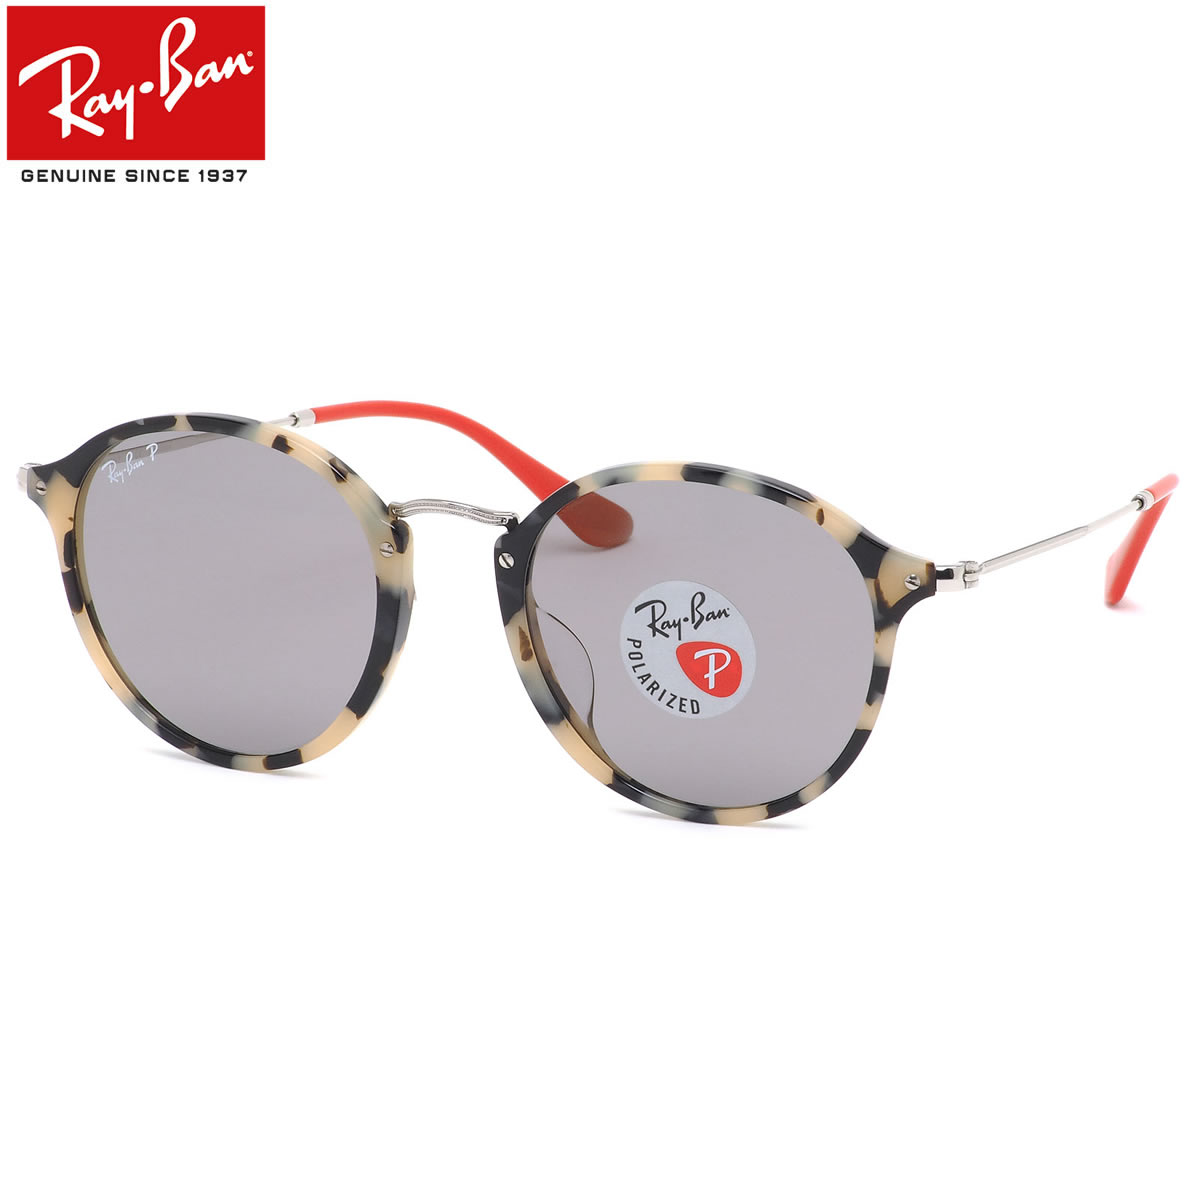 Ray-Ban レイバン サングラス RB2447F 1247P2 49サイズ 52サイズ ラウンド 丸サングラス ラウンドフレック ROUND FLECK フルフィット 偏光 ポララズド ライトカラー グレー メンズ レディース